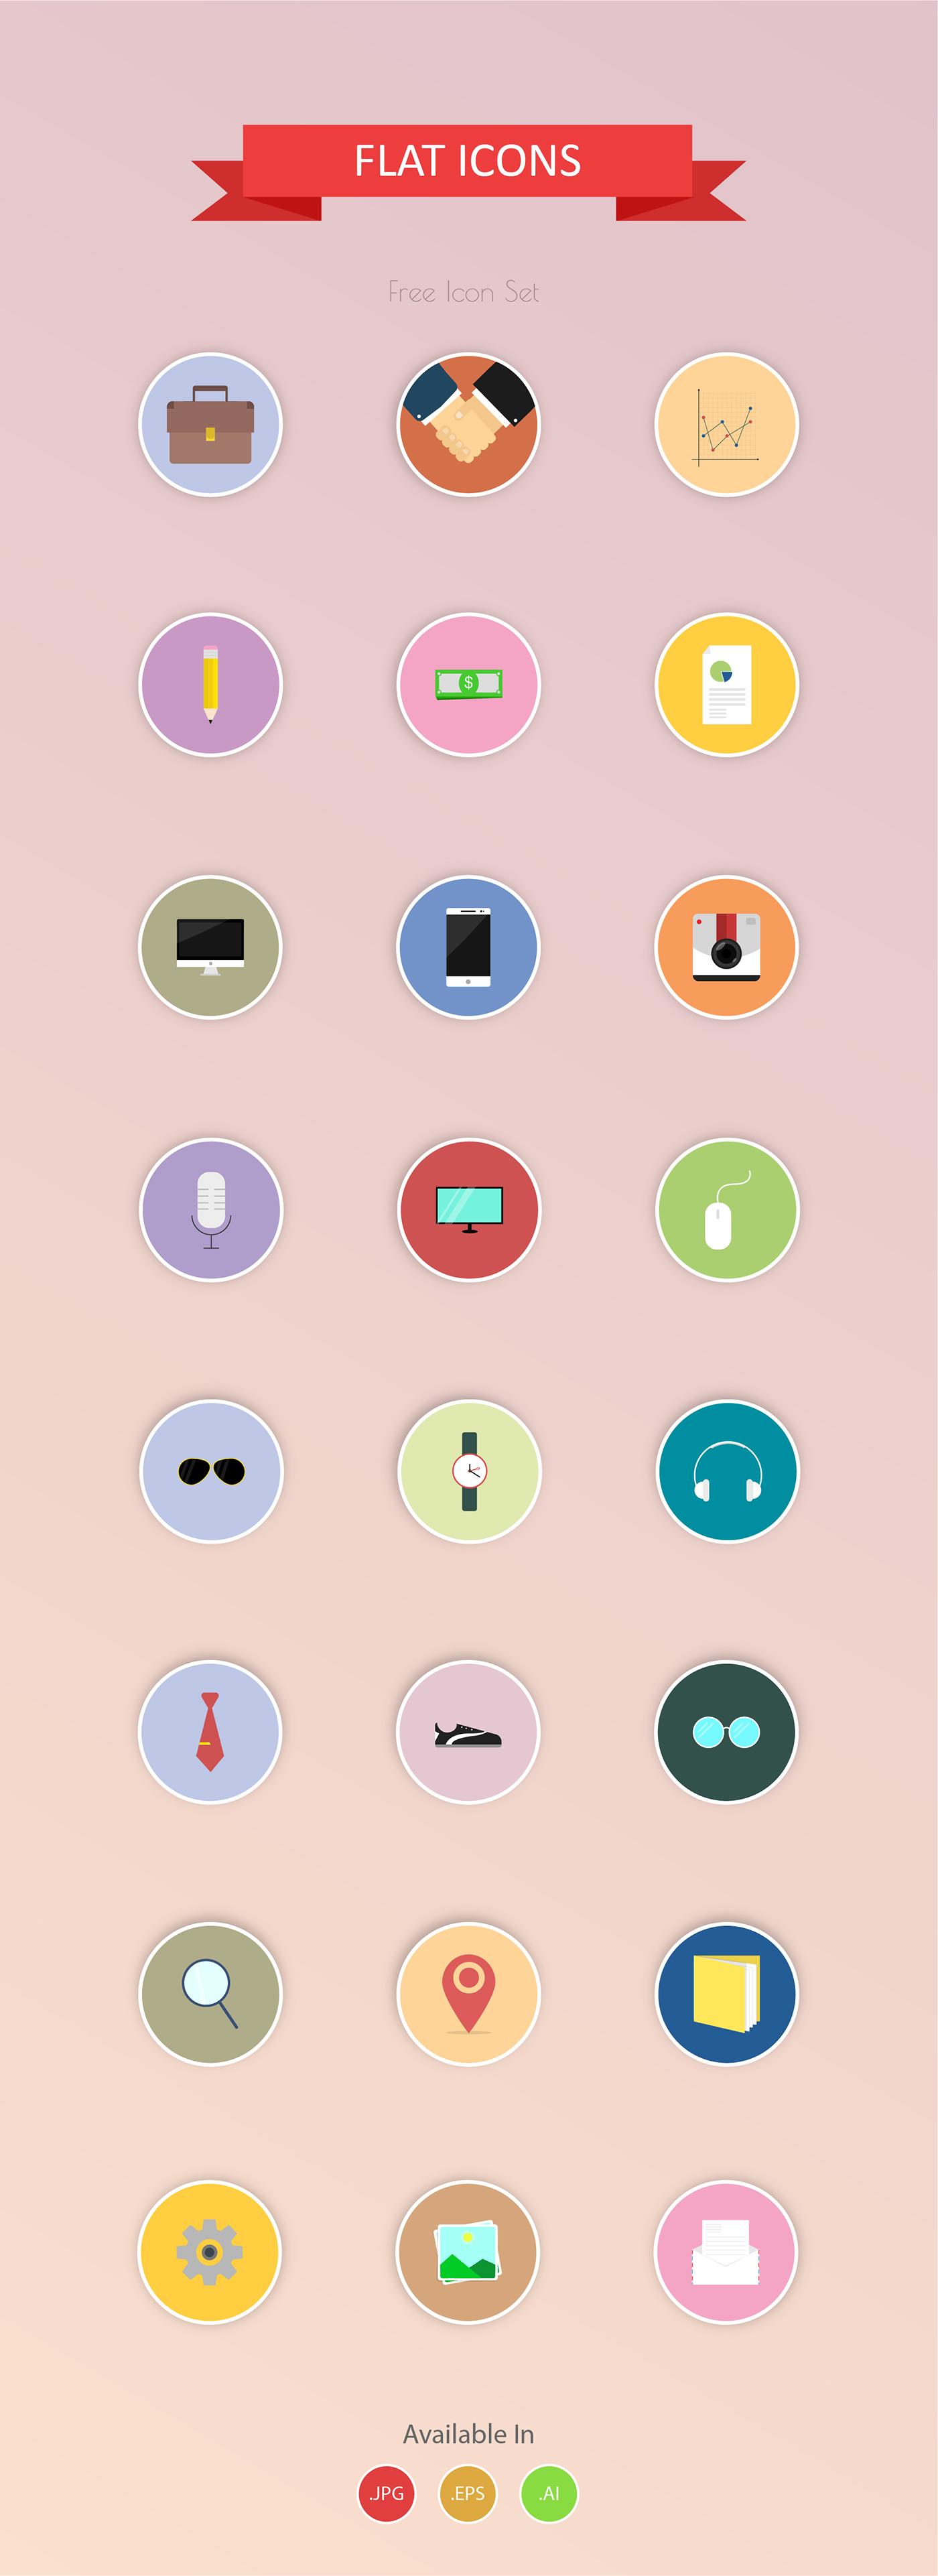 vector,Illustrator,icon design ,flat icons,free use,business,Style,Fashion ,UI/UX,media